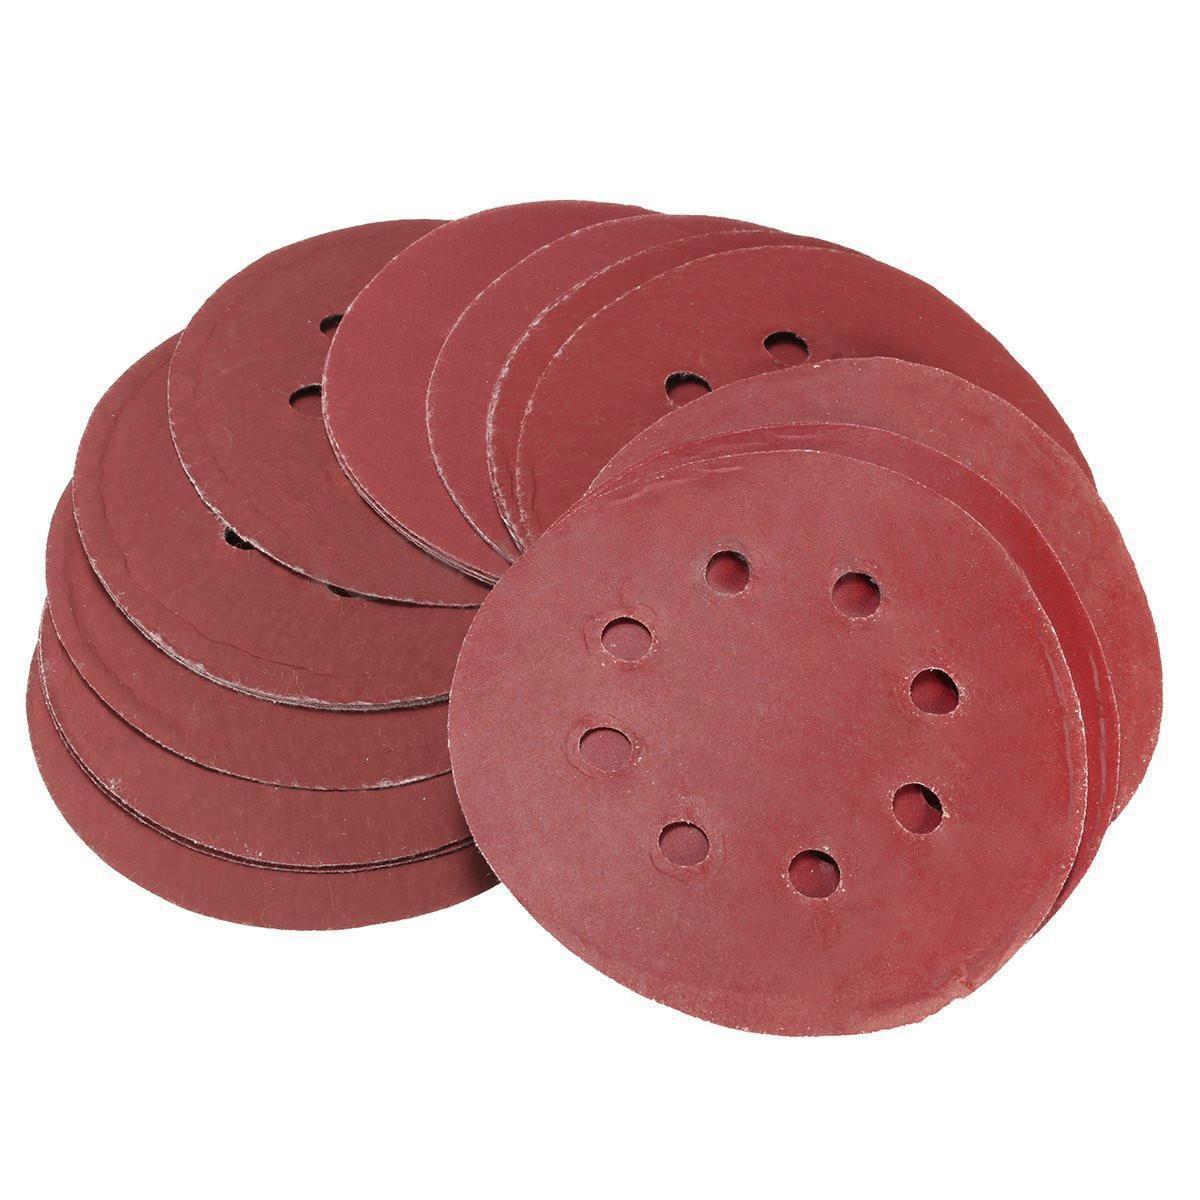 TOOGOO(R) 25pcs 5 Inch Sanding Discs 125mm 8 Hole Sandpaper 800 1000 1200 1500 2000 Grit